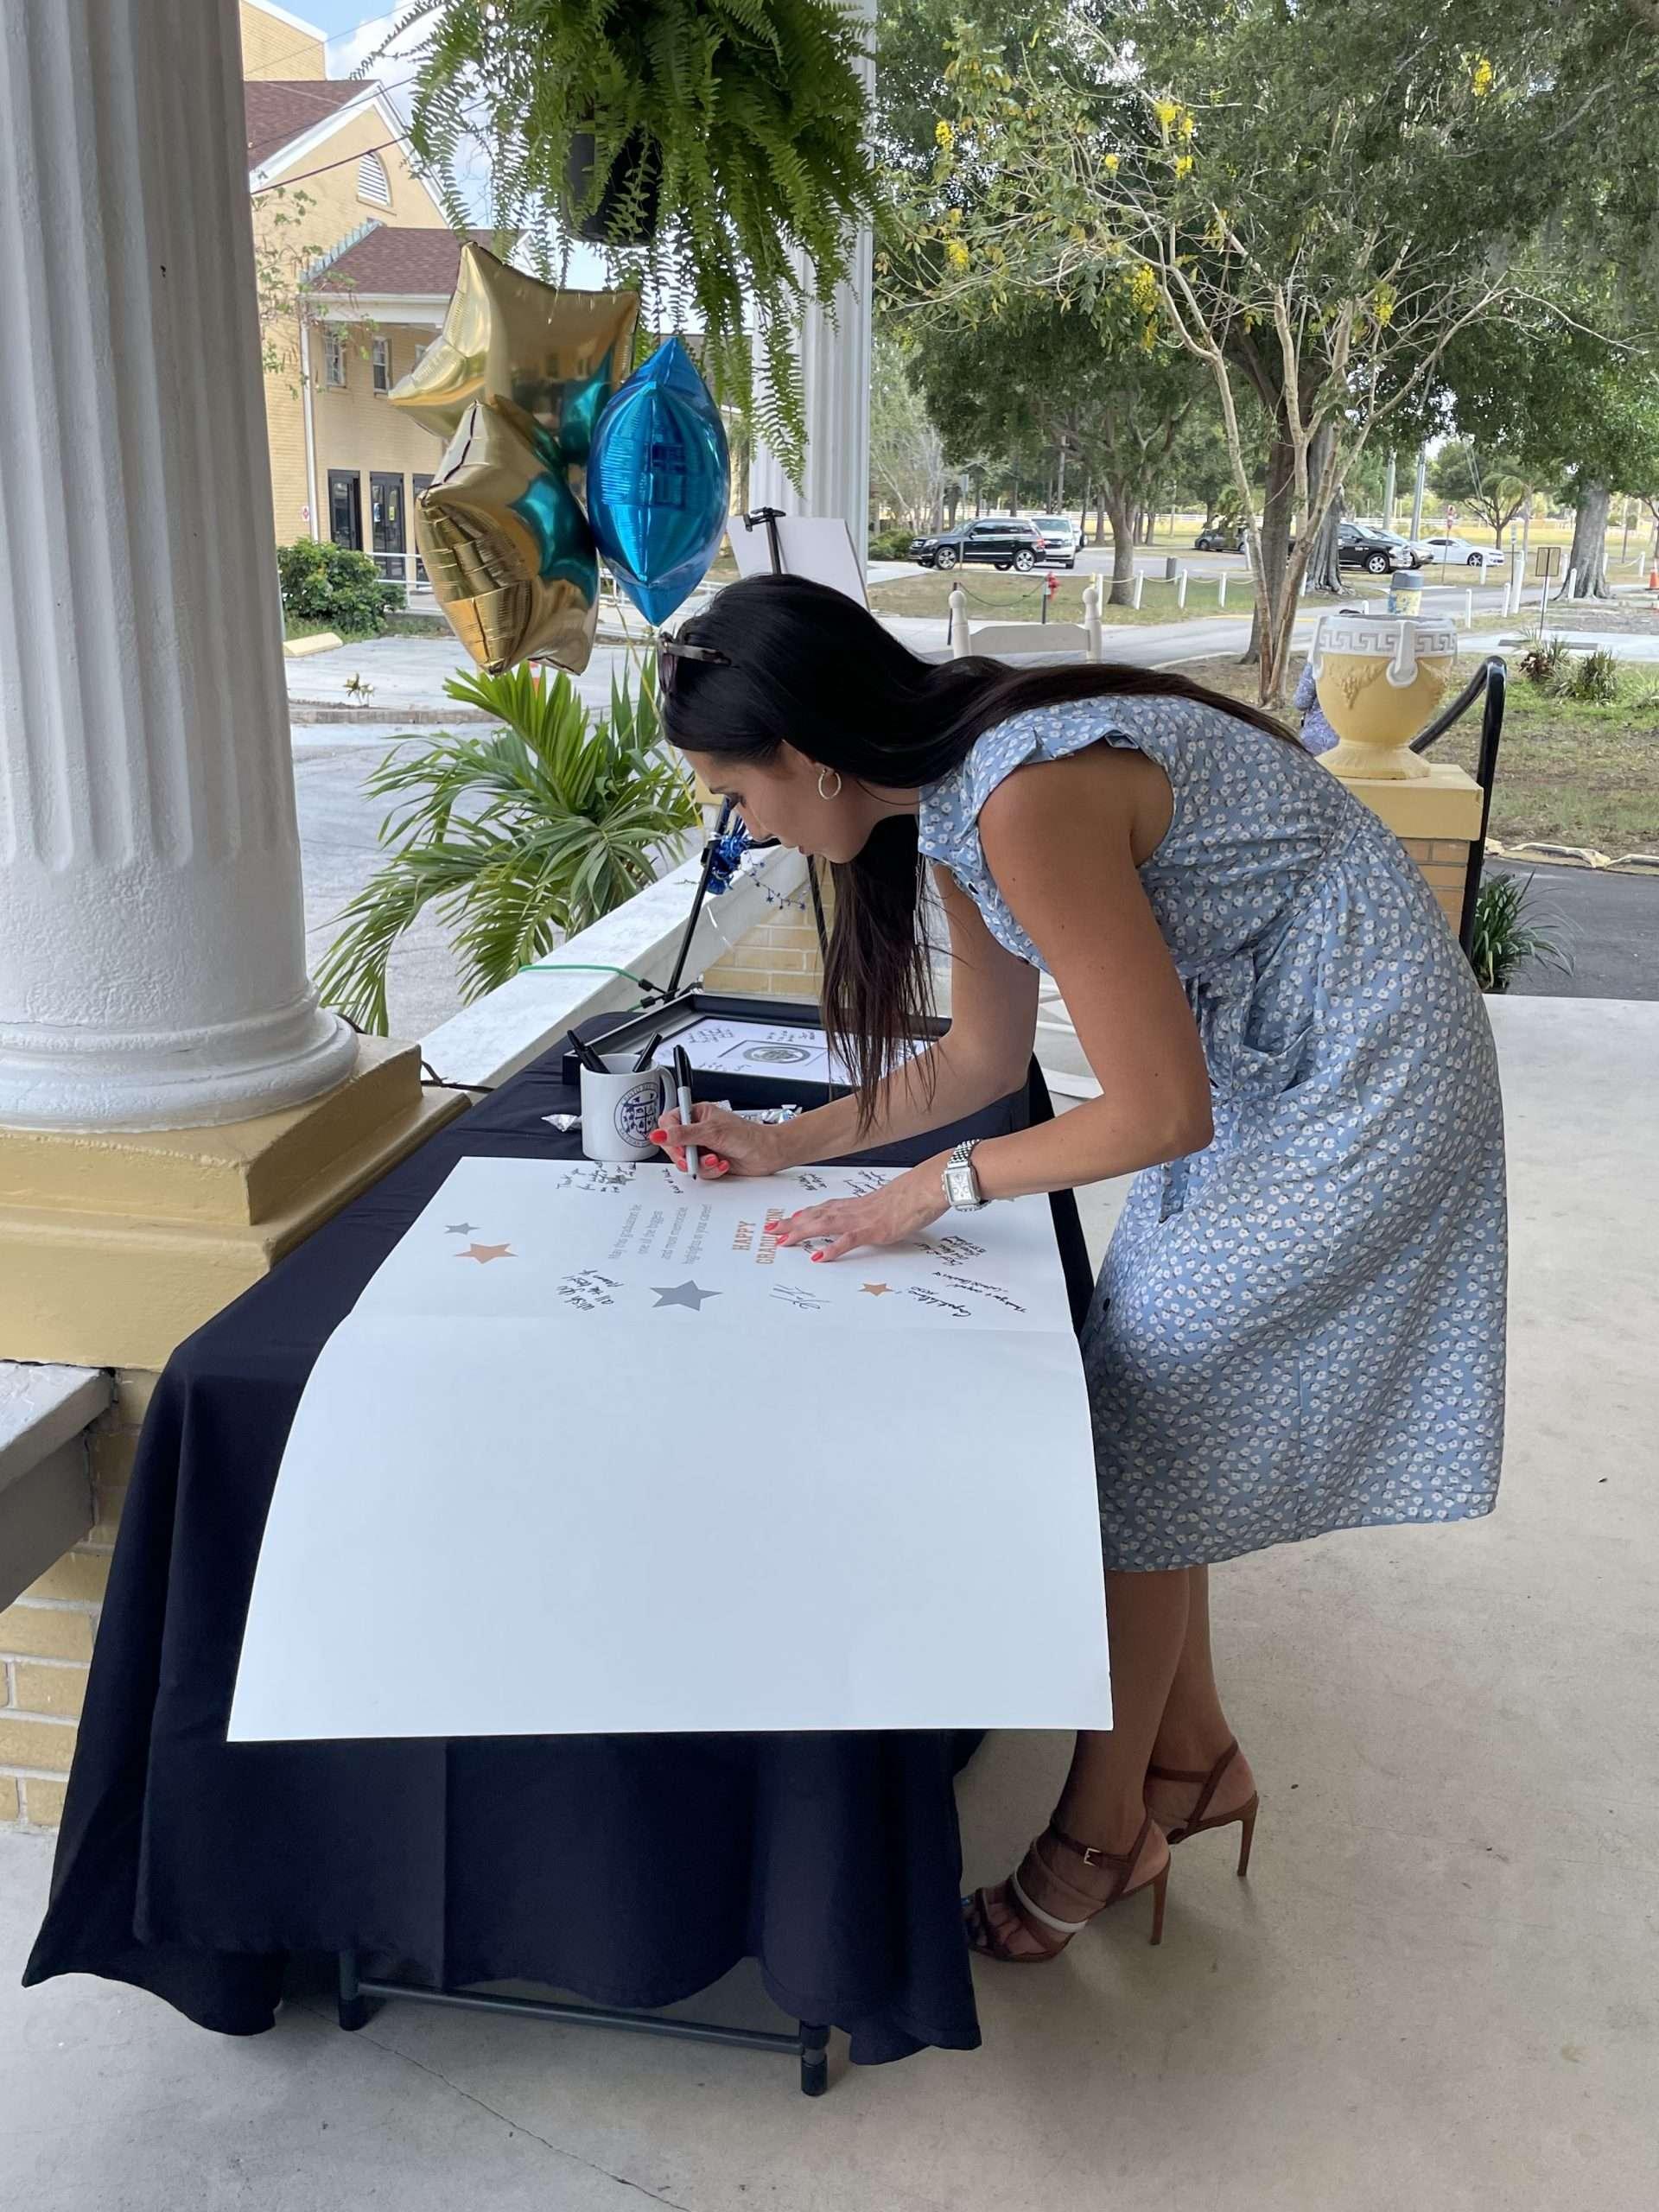 CWSP Partner Appreciation Event